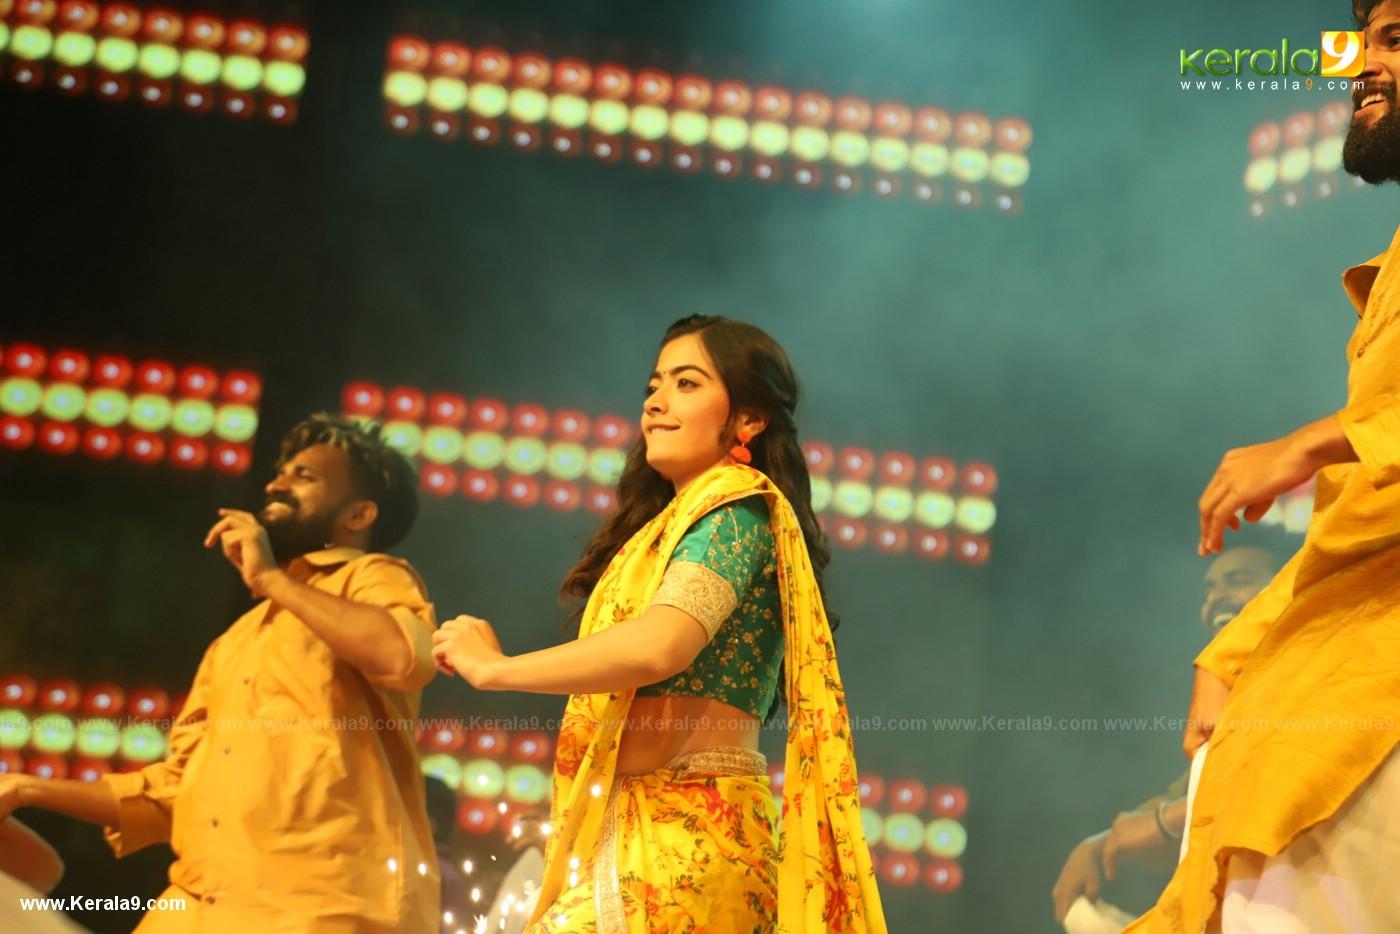 Dear Comrade movie premotion kerala kochi photos 159 - Kerala9.com